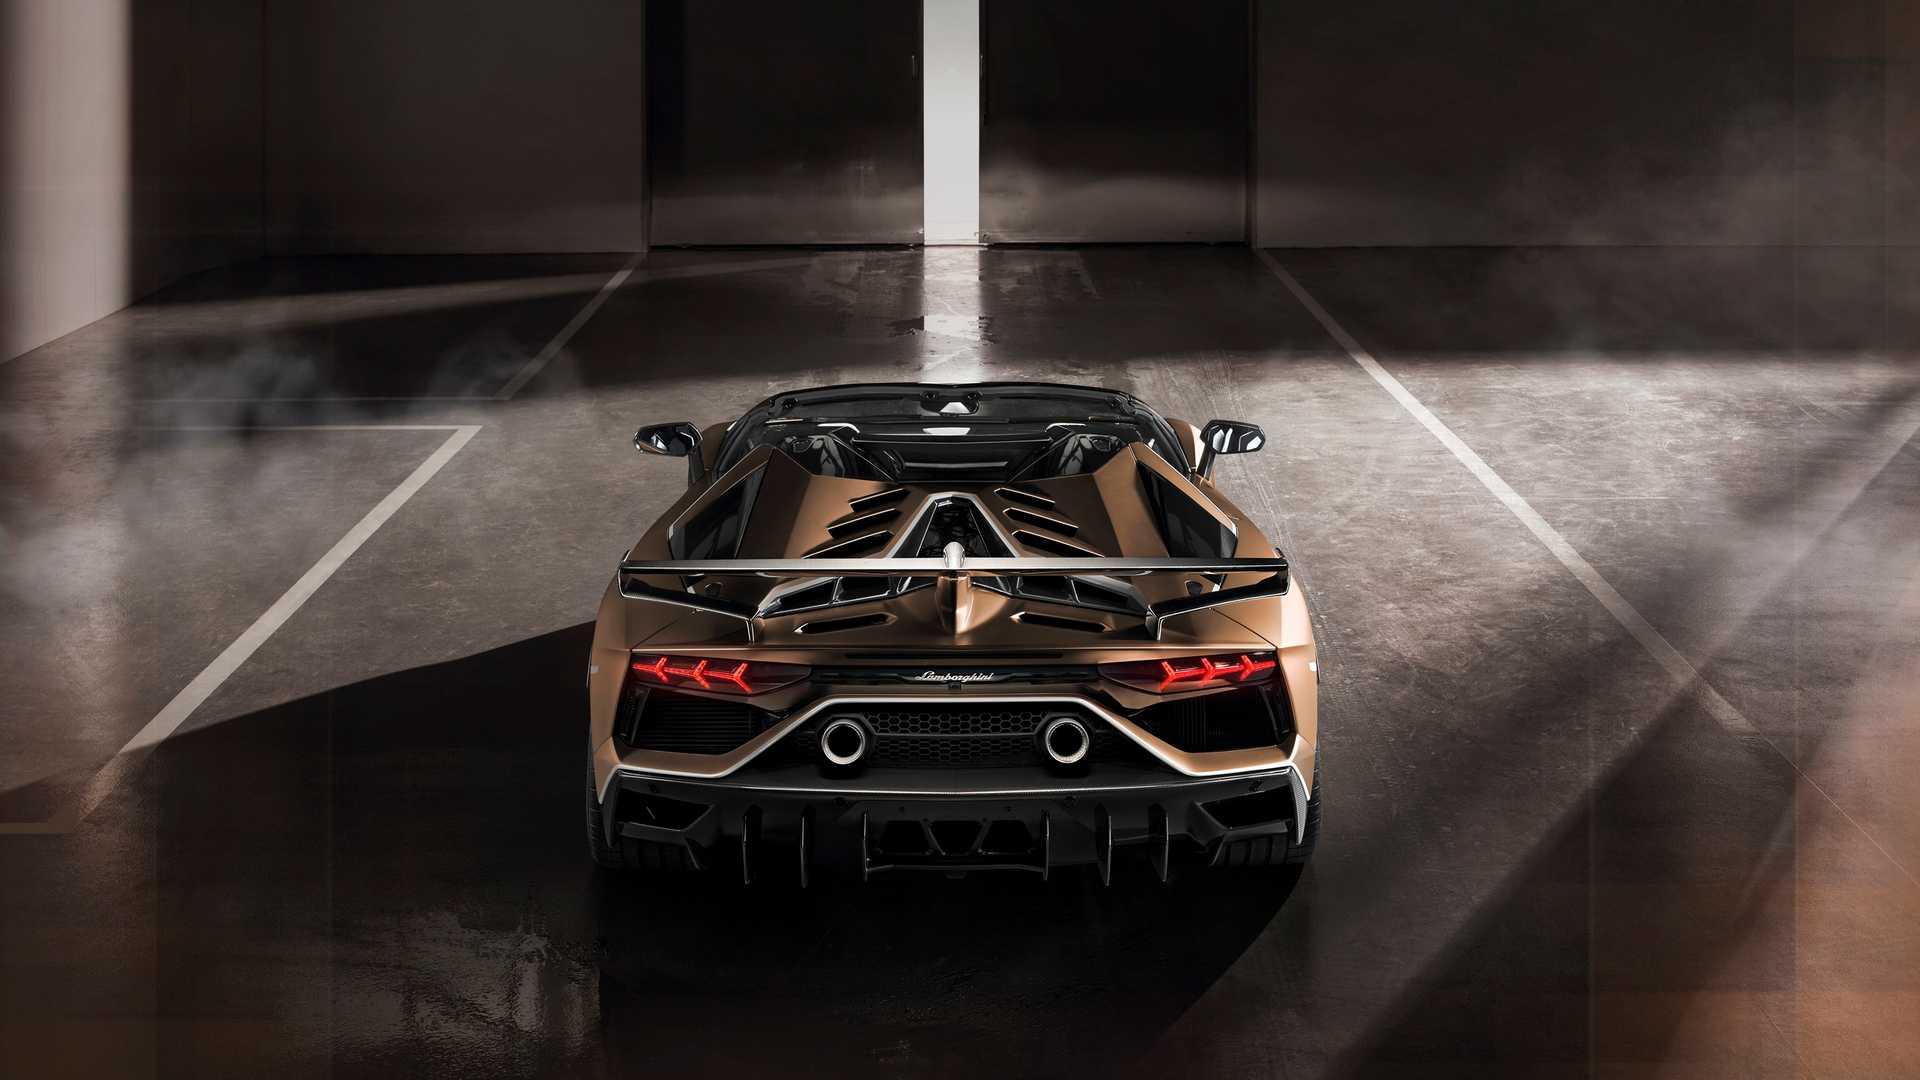 2020 Lamborghini Aventador SVJ Roadster Rear Wallpaper (13)